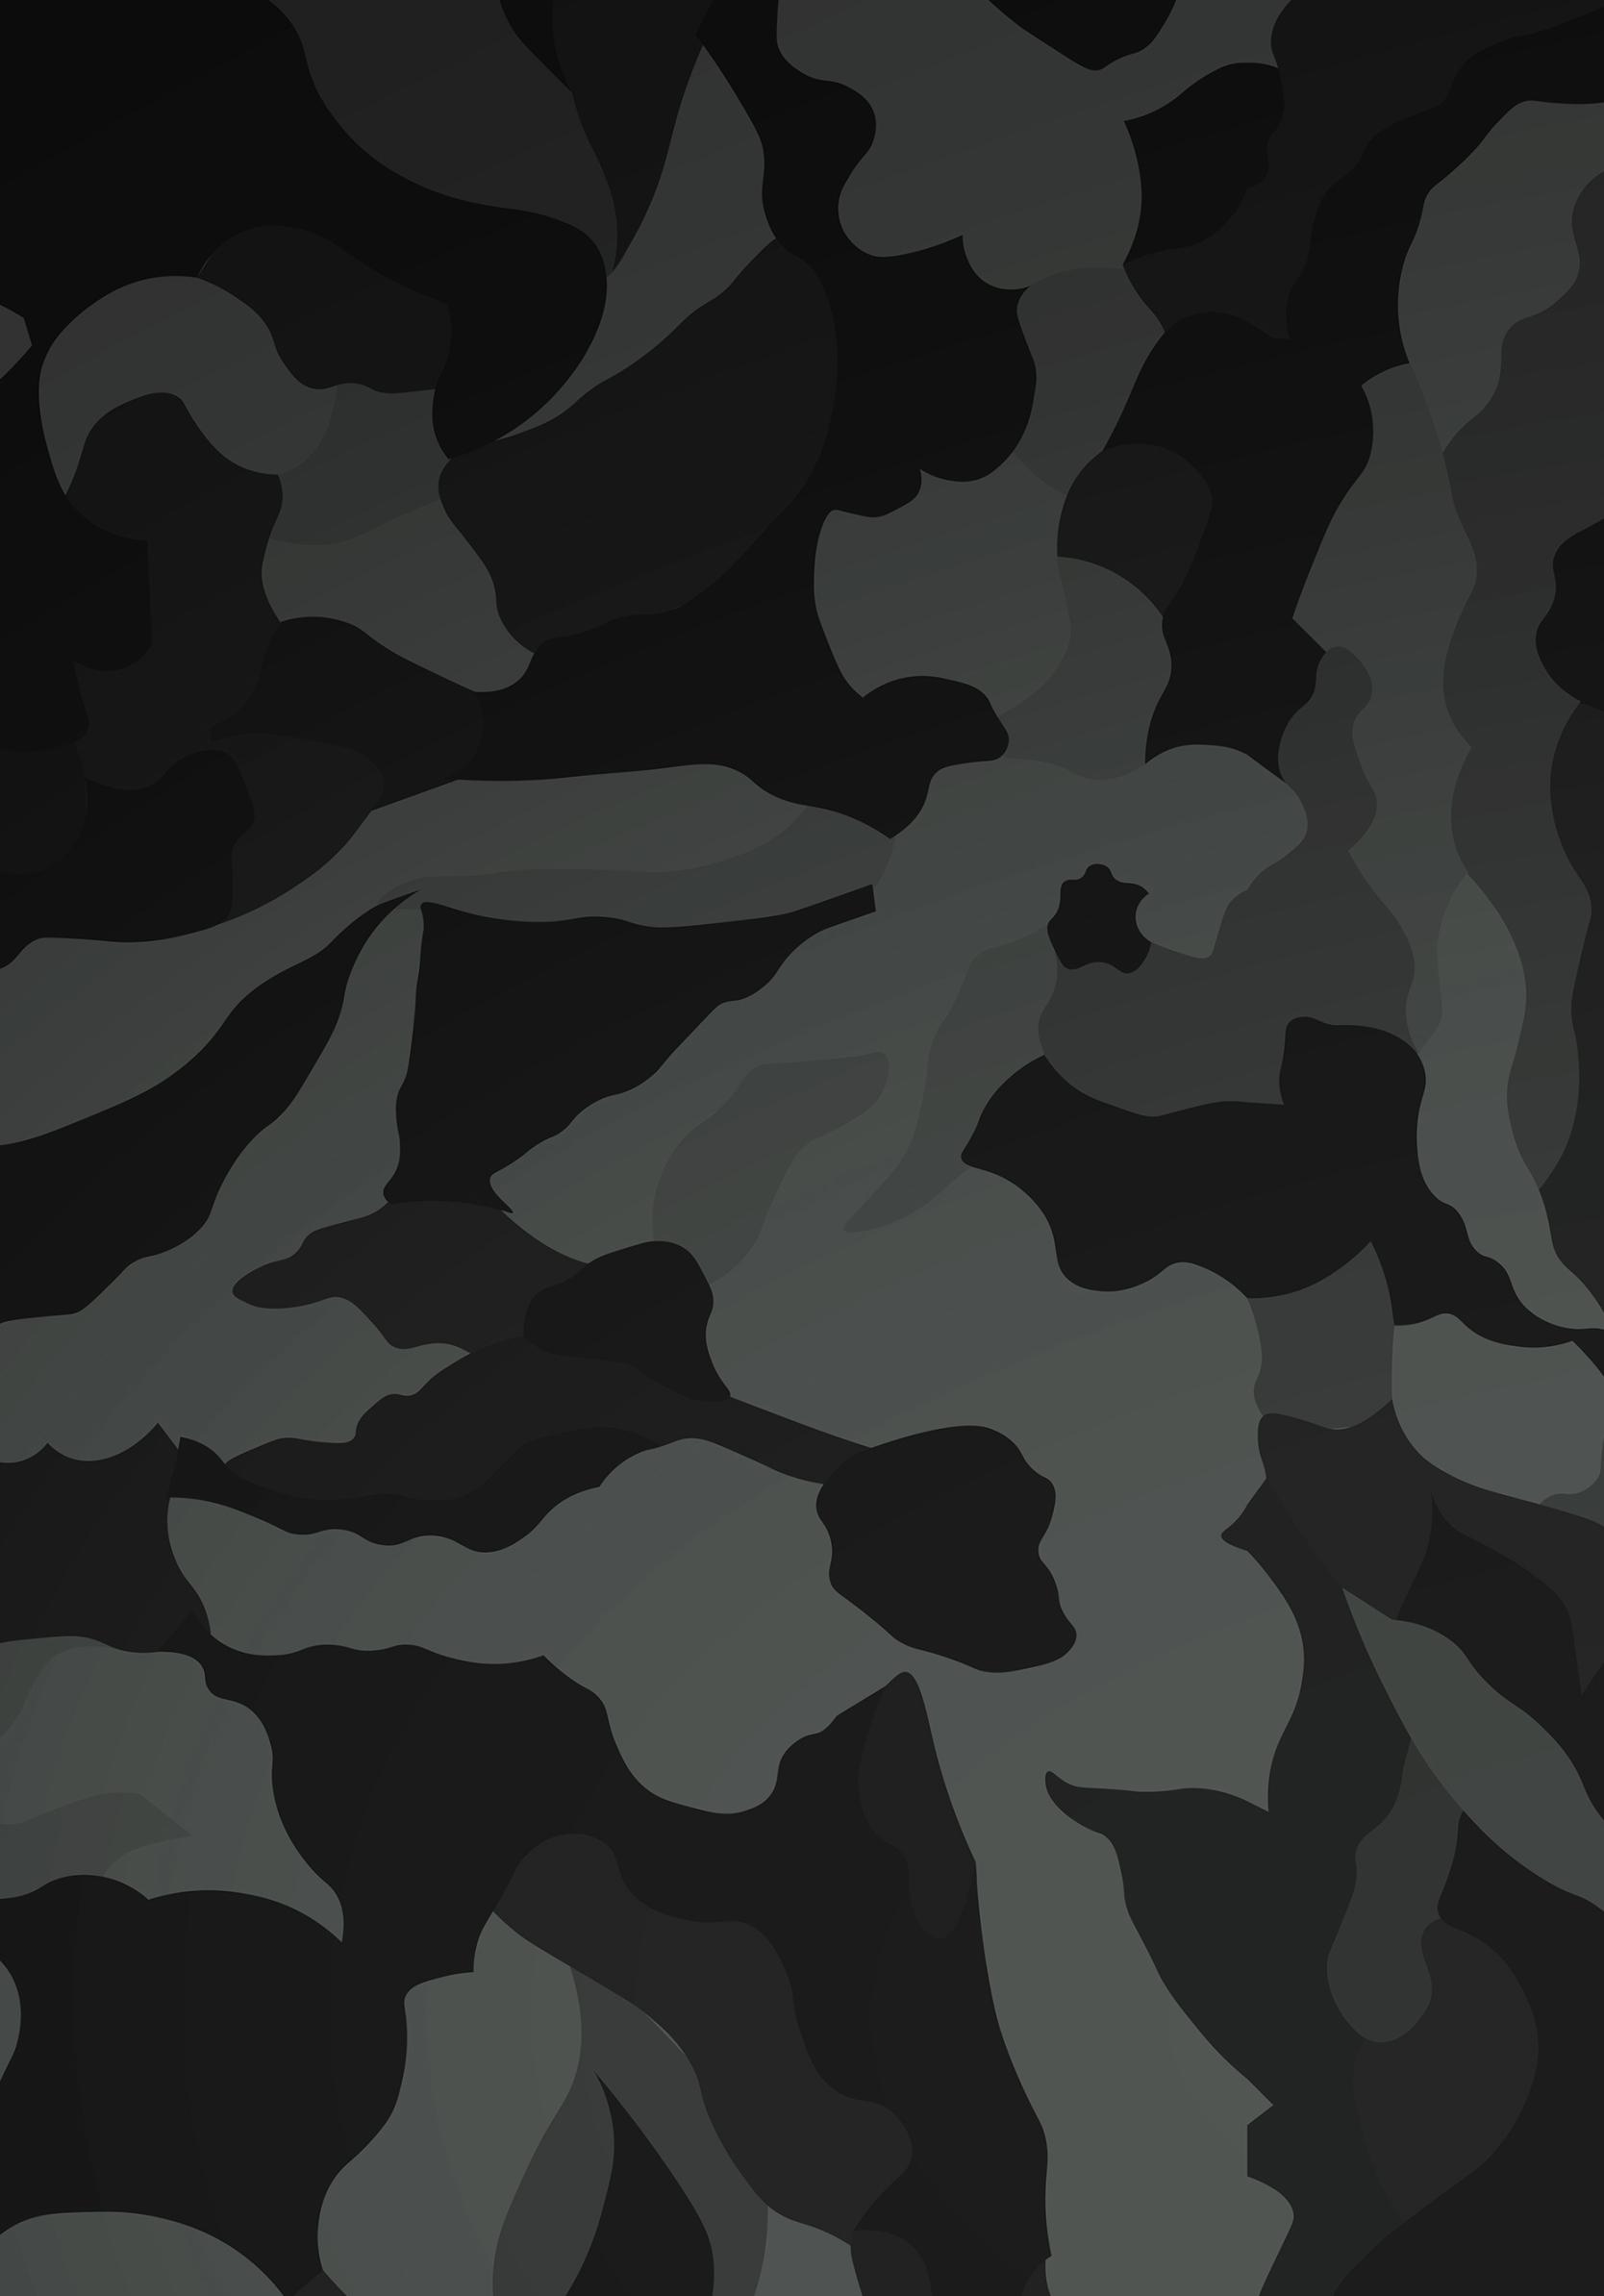 1668x2388 Black Abstract 4K 1668x2388 ...